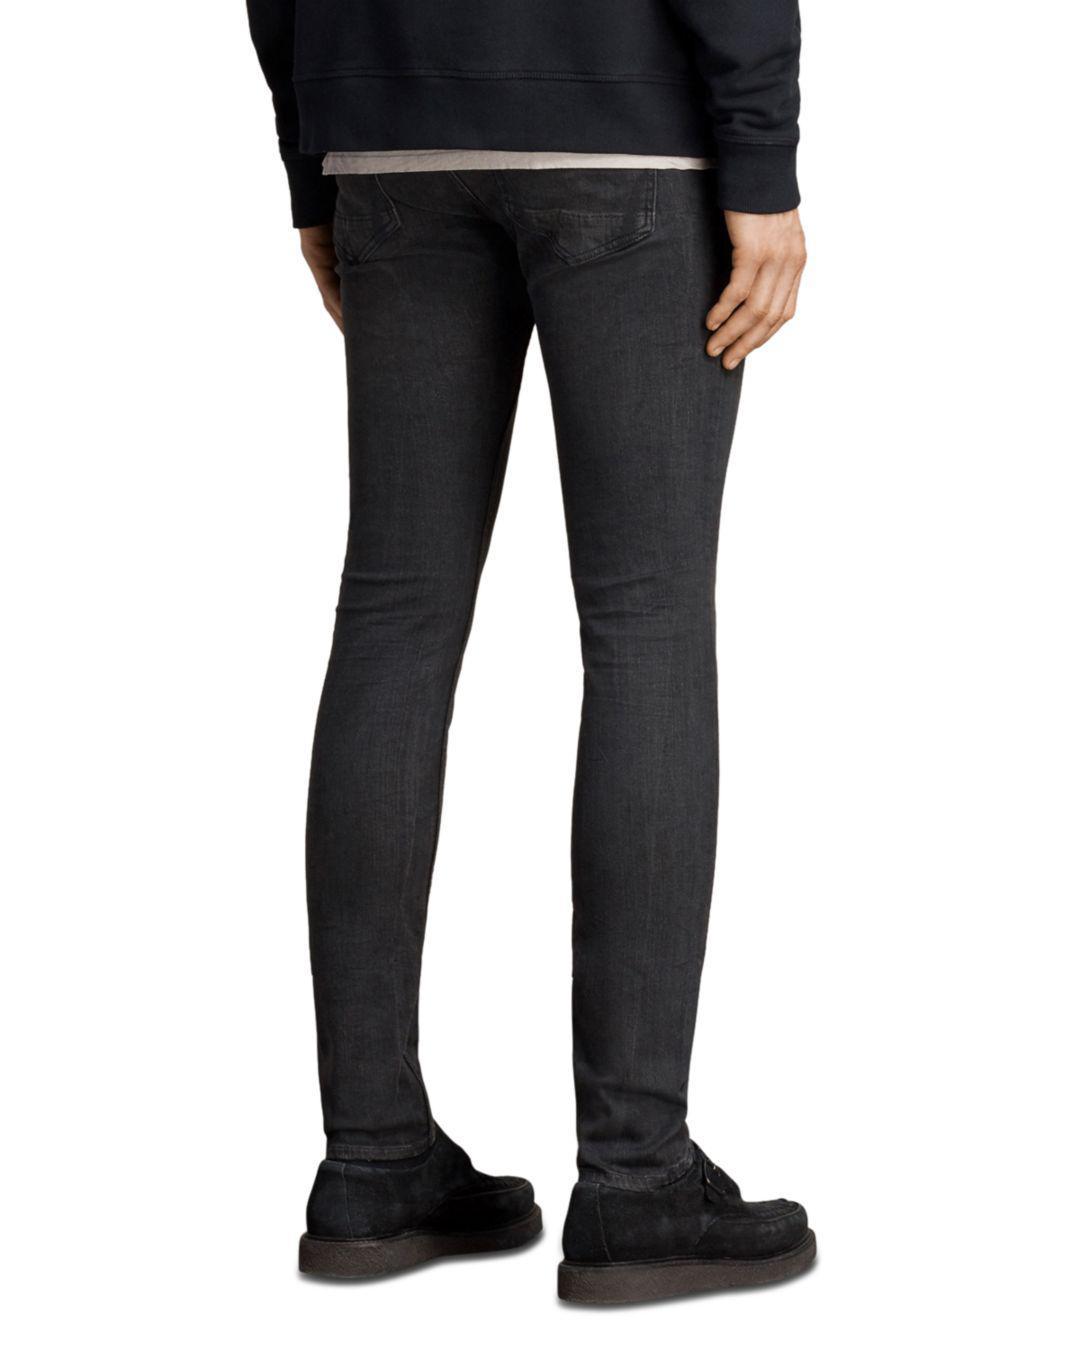 AllSaints Denim Print Cigarette Slim Fit Jeans In Black for Men